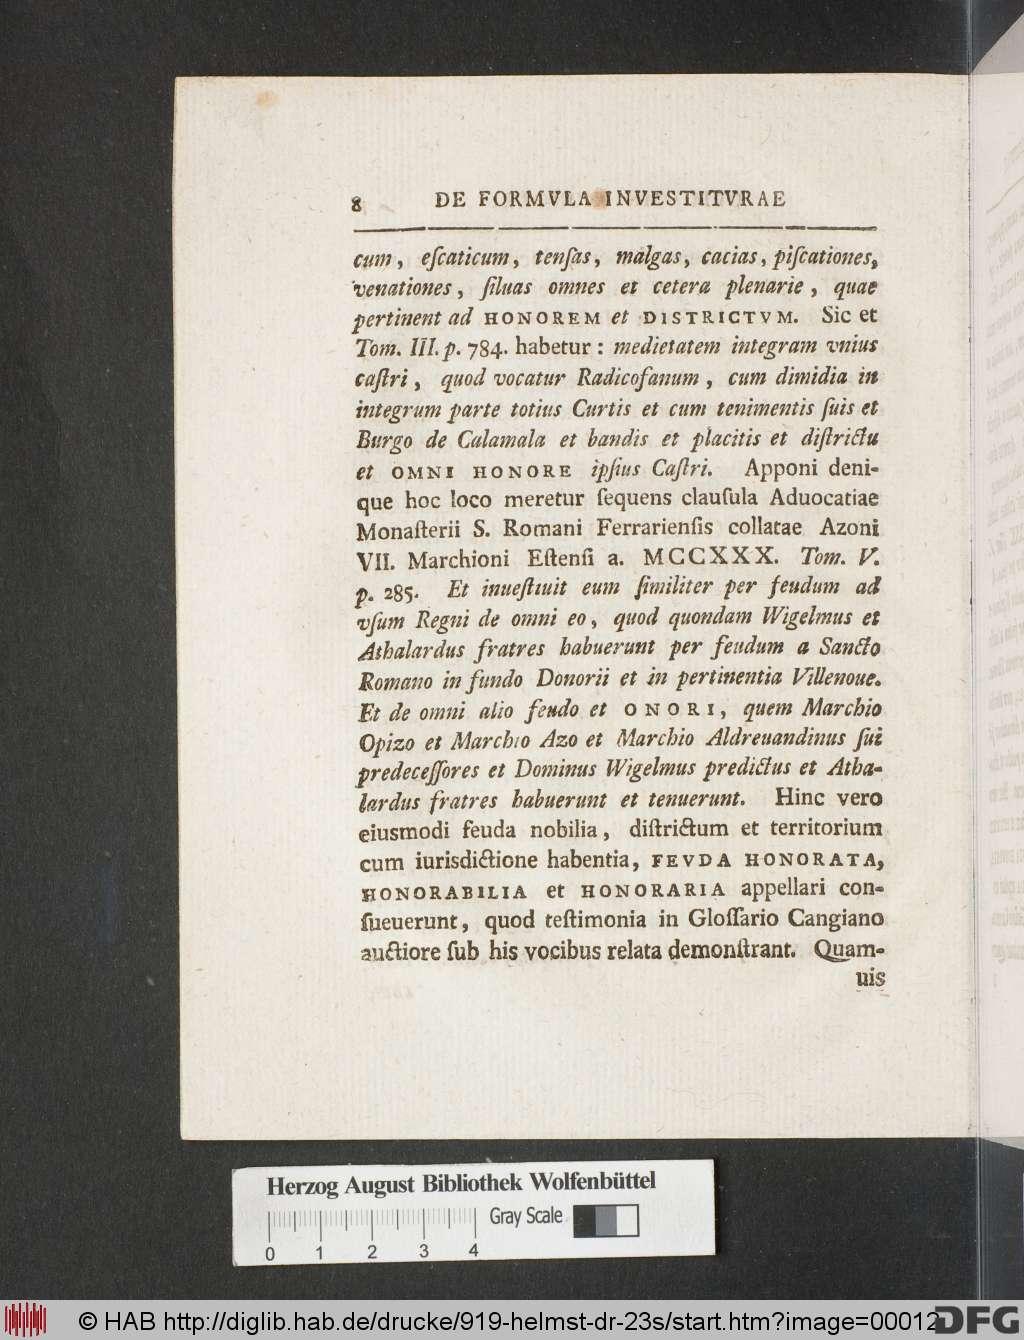 https://diglib.hab.de/drucke/919-helmst-dr-23s/00012.jpg